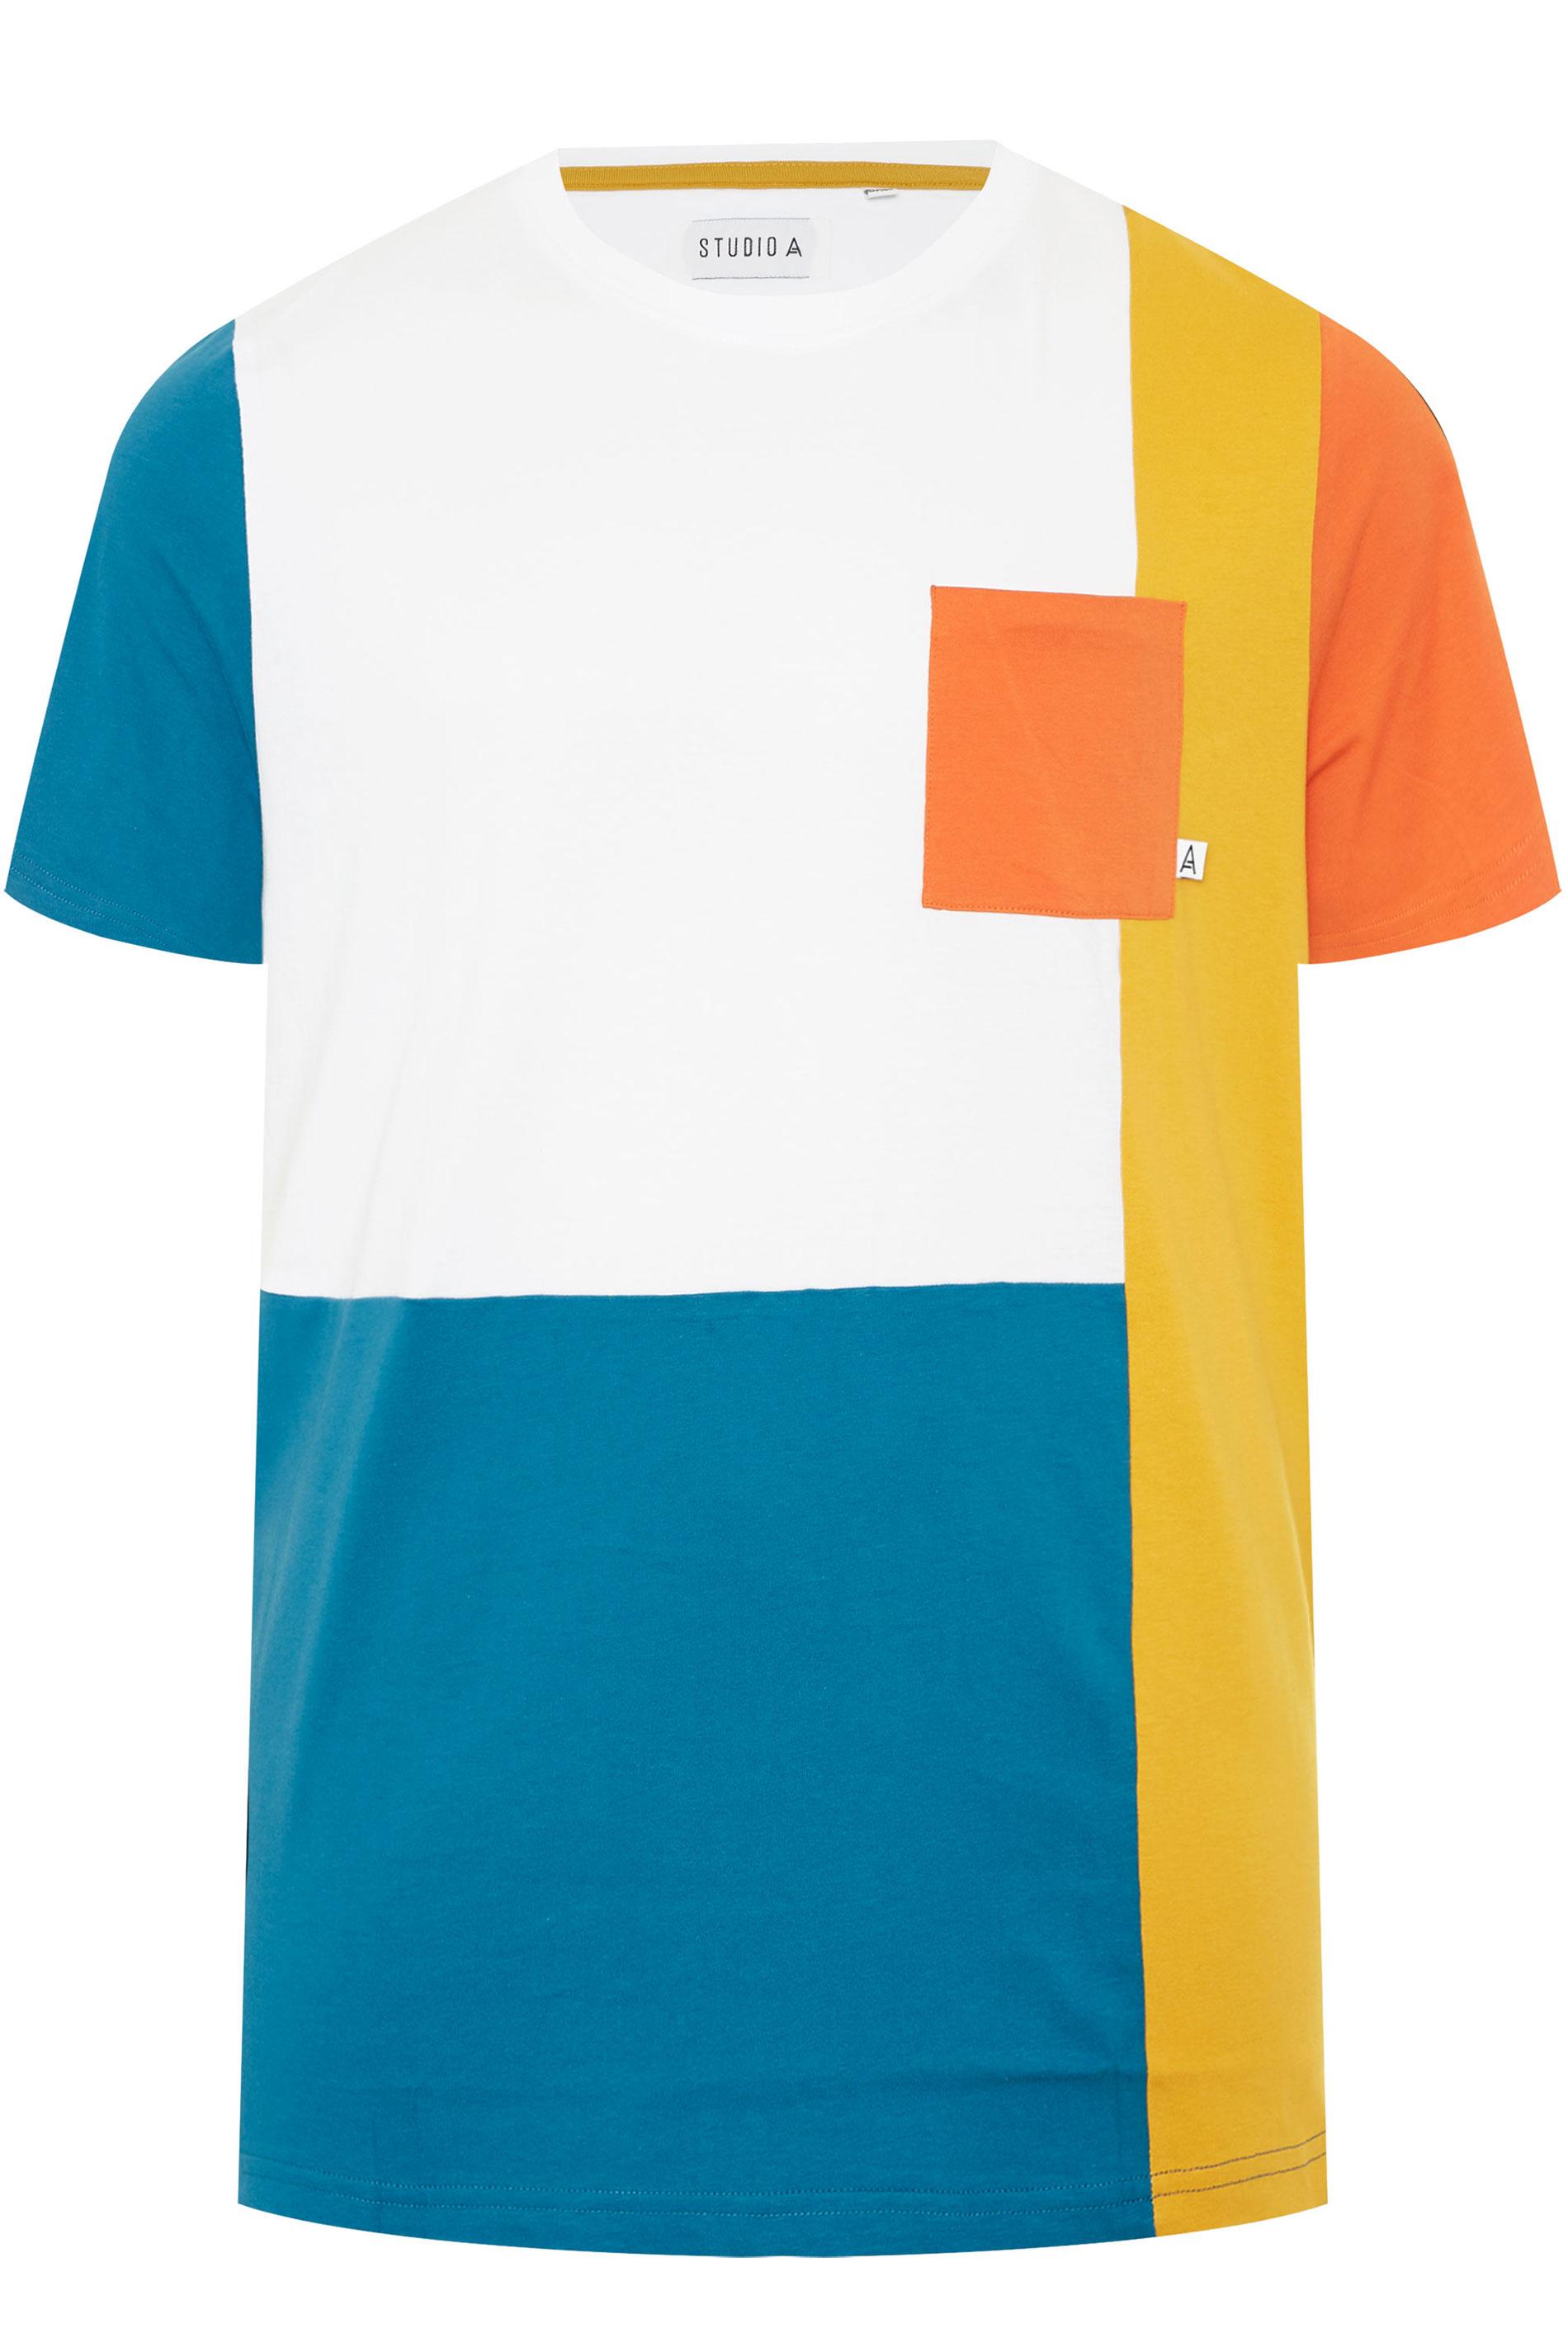 STUDIO A White Colour Block T-Shirt